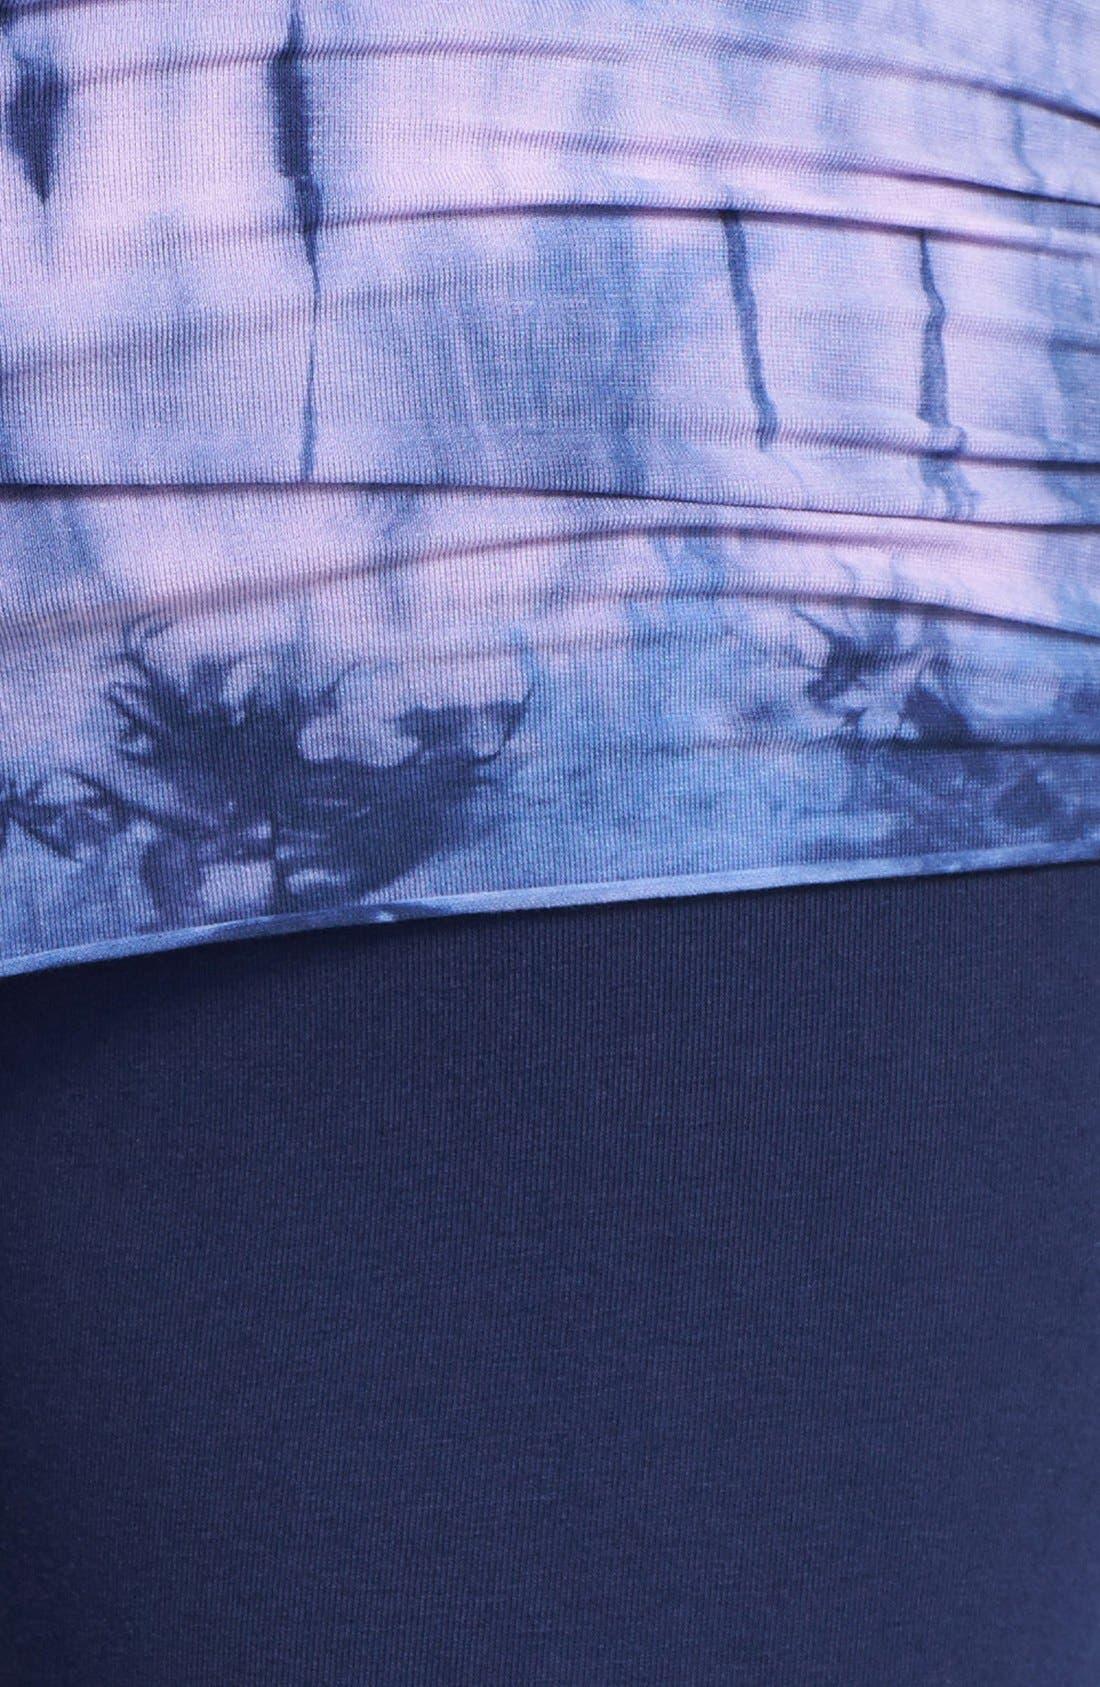 Alternate Image 4  - Omgirl 'Nomad - Mad Plaid' Organic Cotton Foldover Leggings